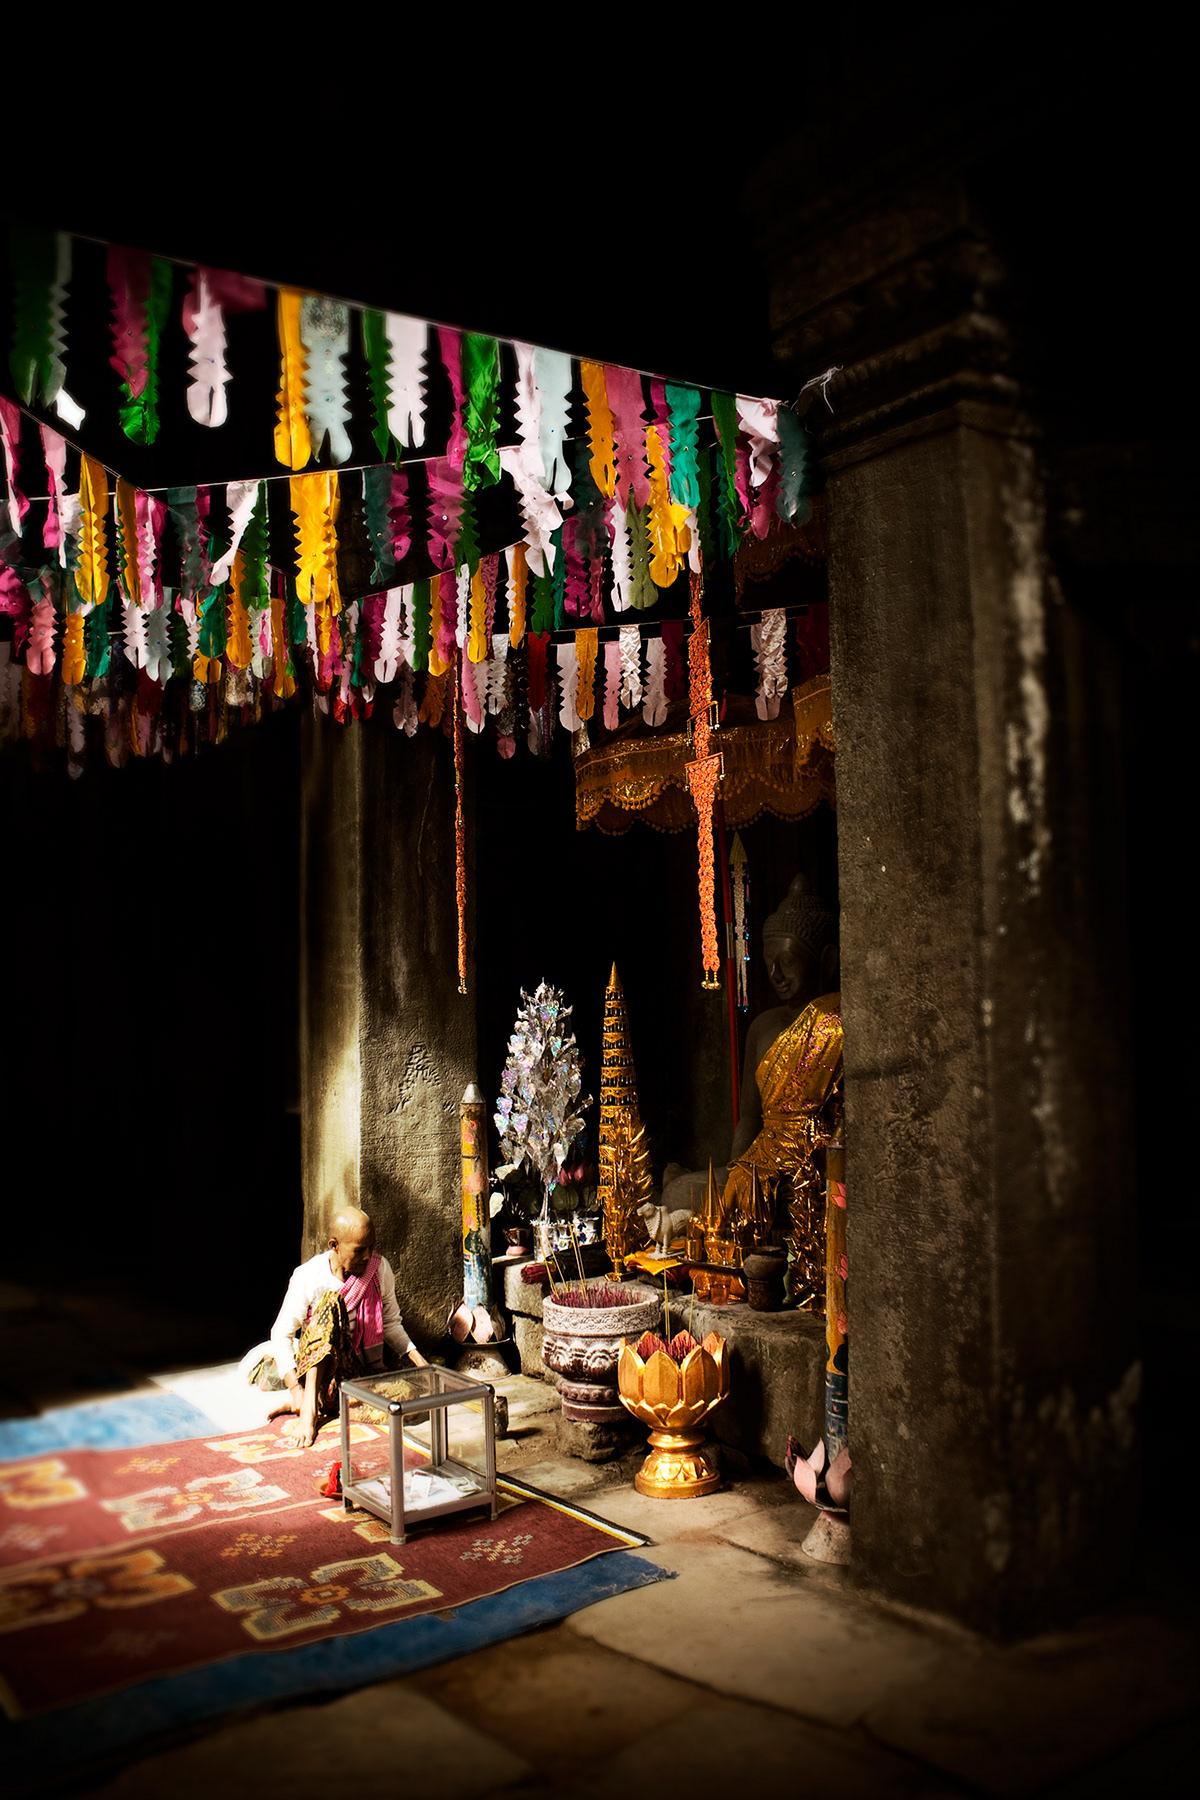 Adobe Portfolio asia banteay kde Bayon Cambodia East Asia east mebon siam reap temples